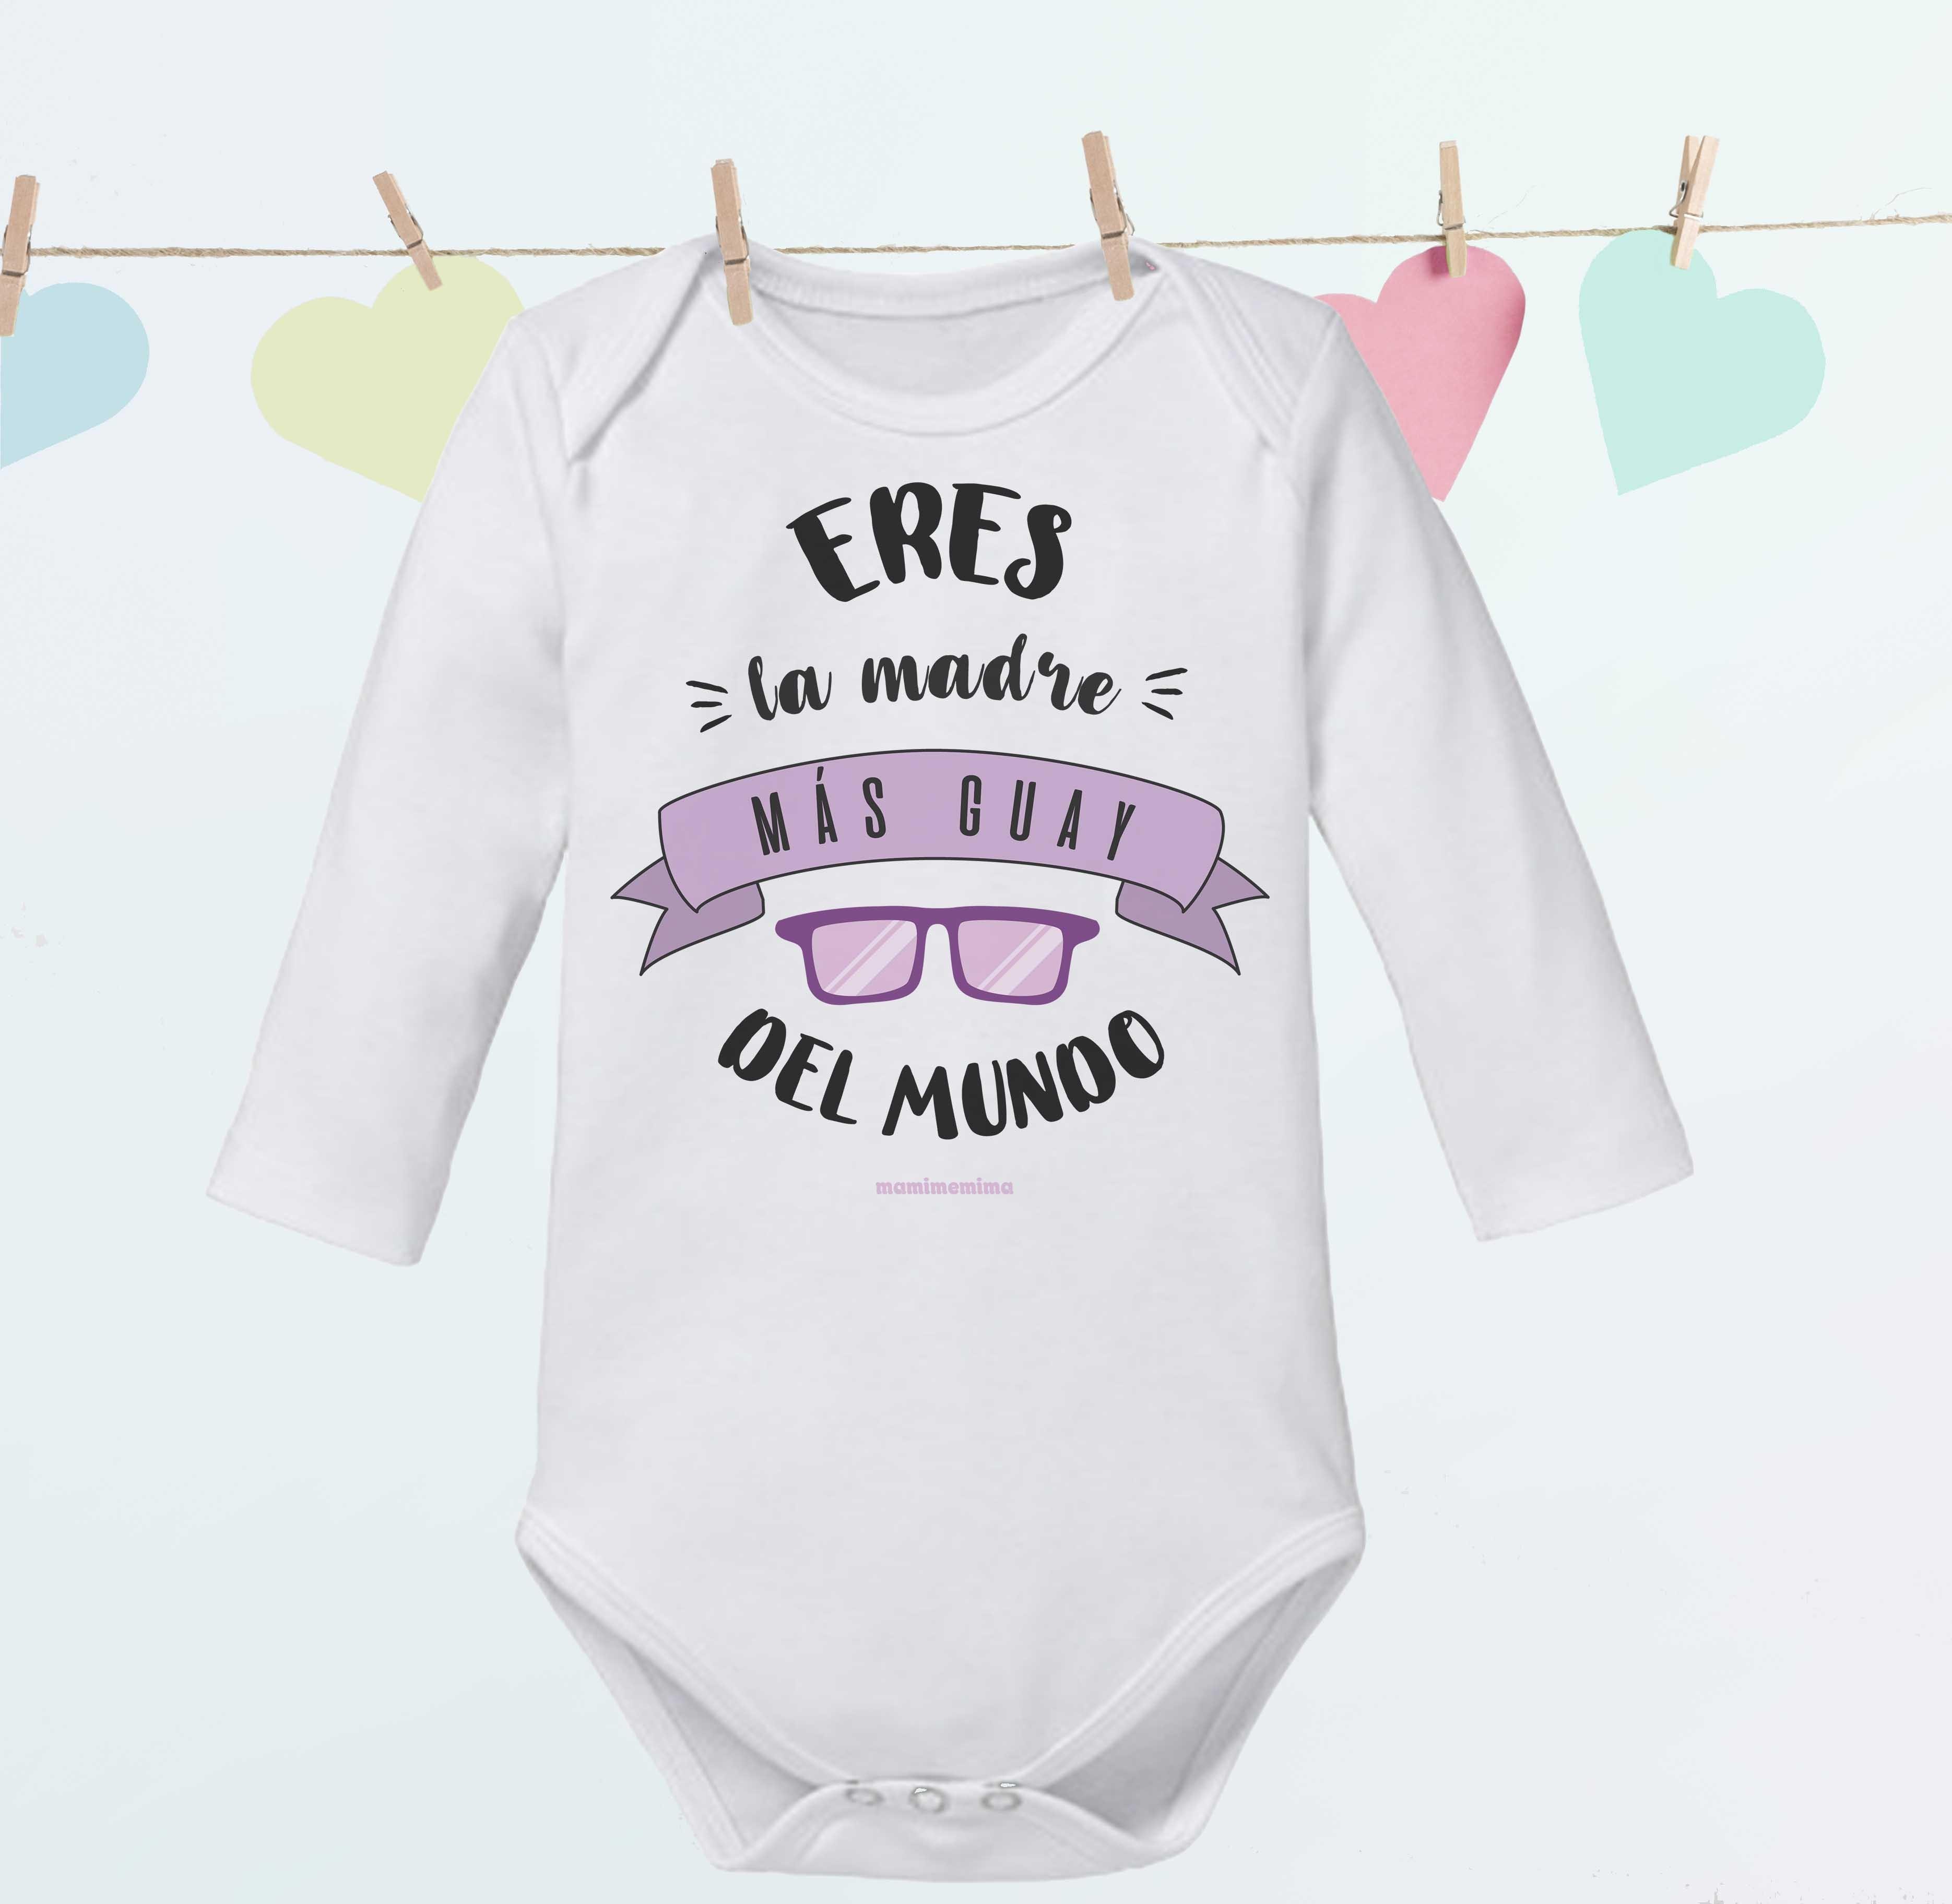 Body Bebé Papá Frases Mamá Regalo Día De La Madre Mami Me Mima